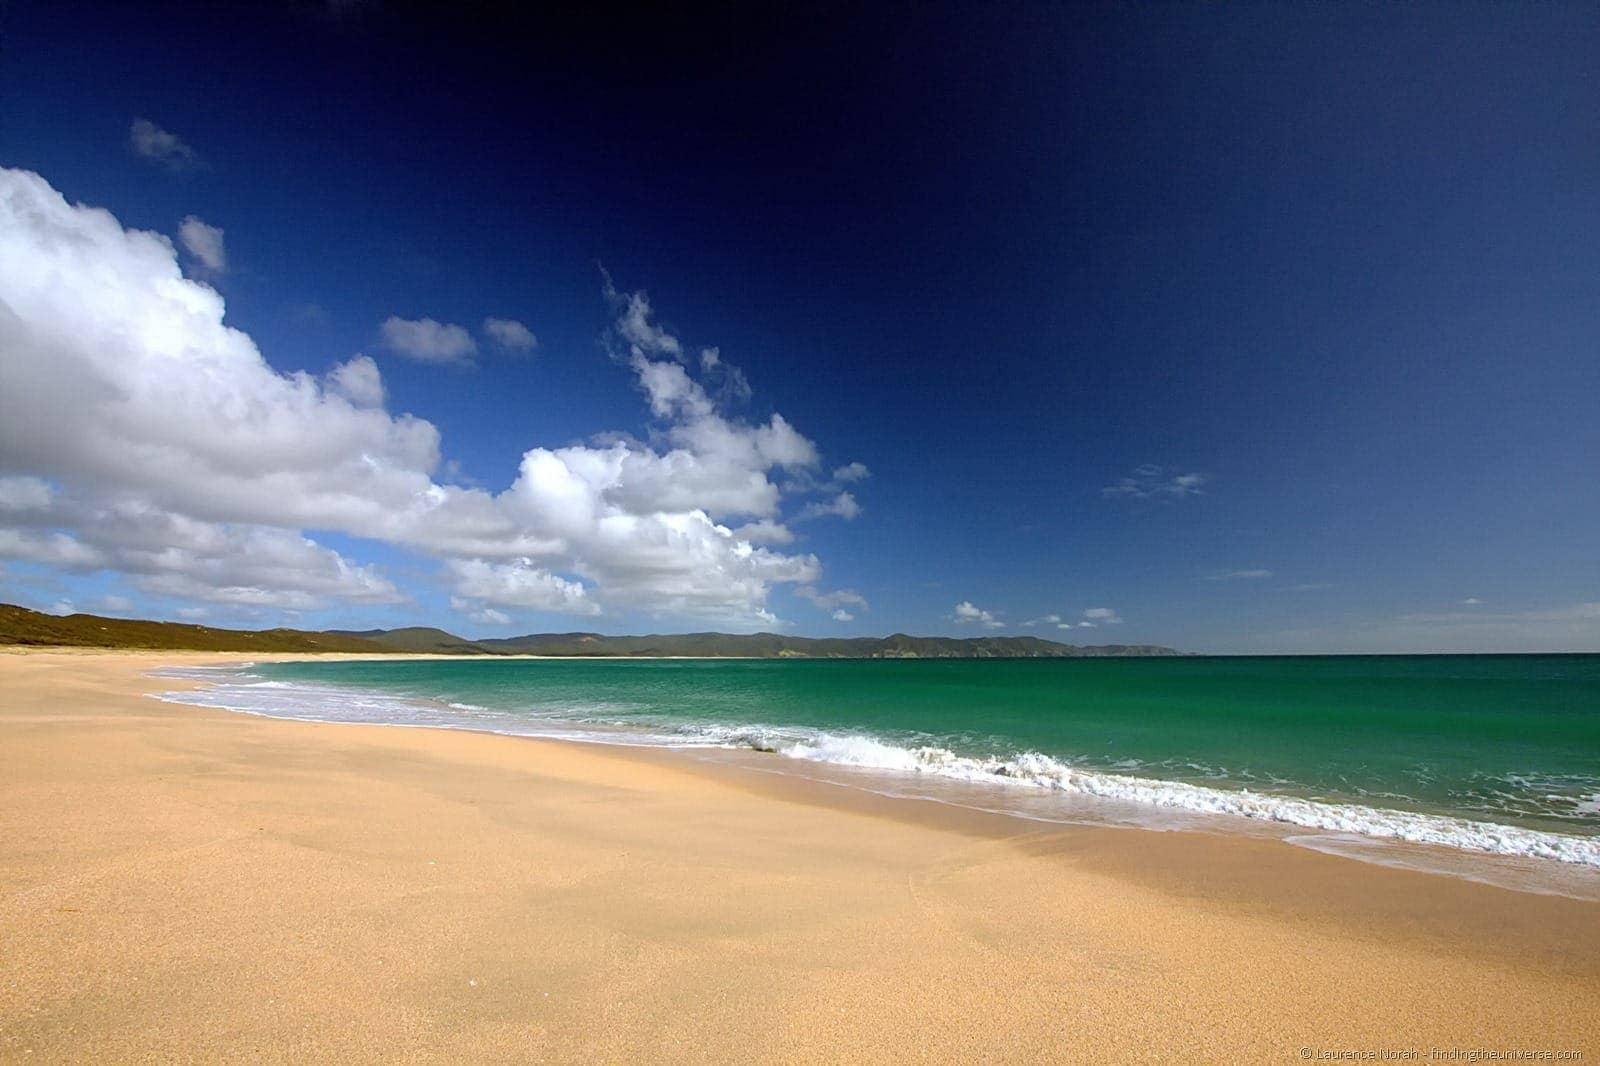 Spirits Bay Beach scaled